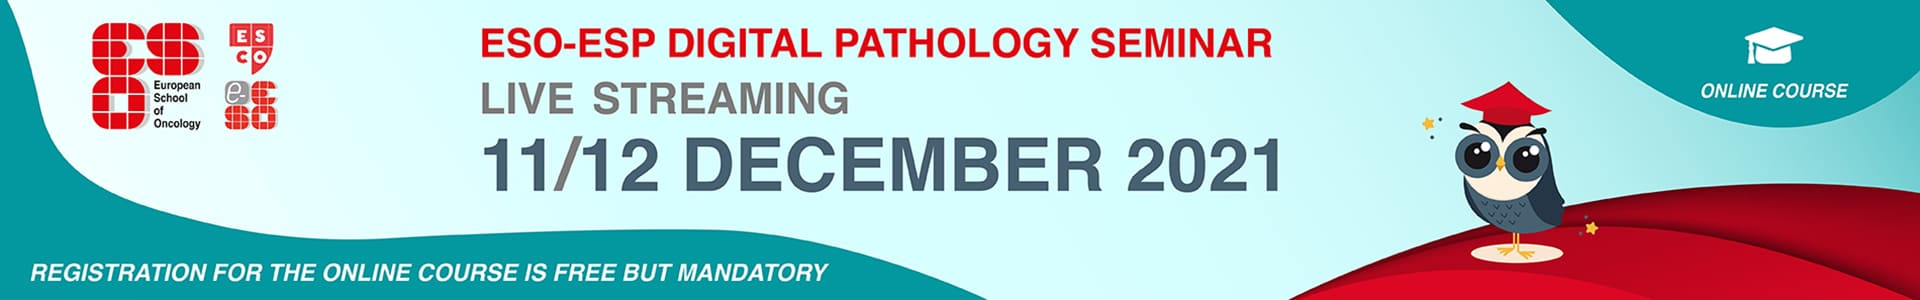 ESO-ESP Digital Pathology Seminar